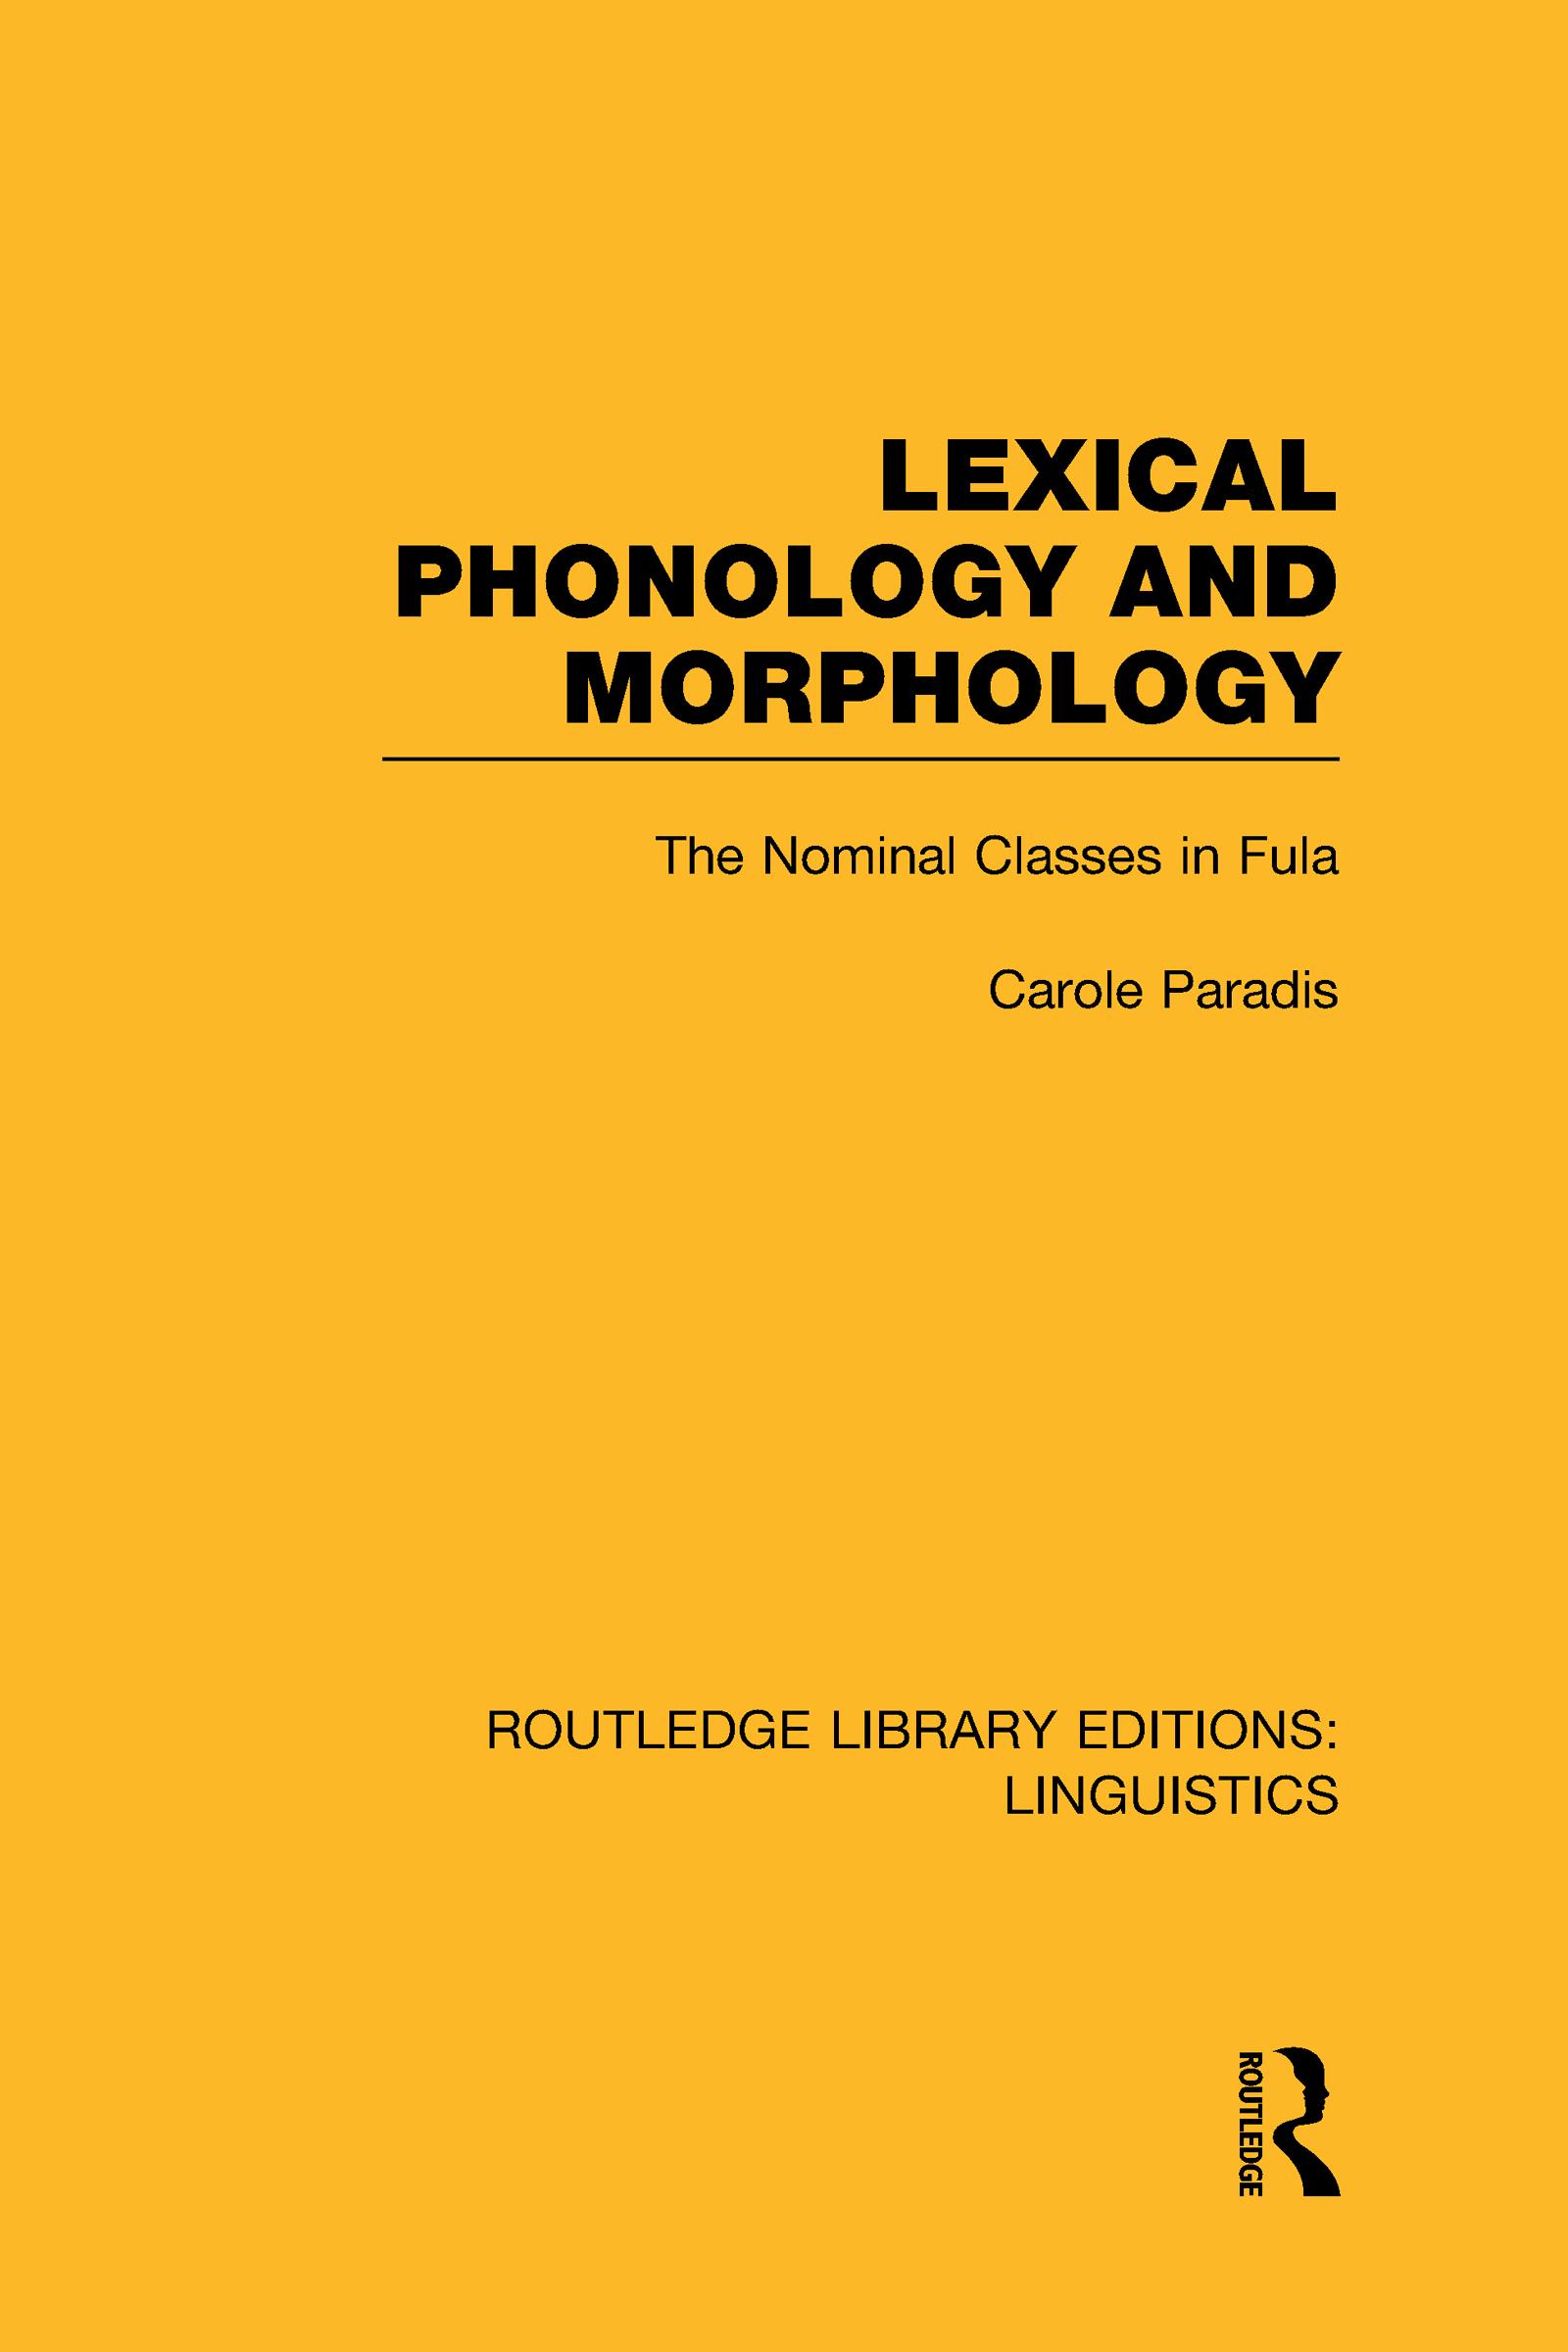 Lexical Phonology and Morphology (RLE Linguistics A: General Linguistics): 1st Edition (Hardback) book cover